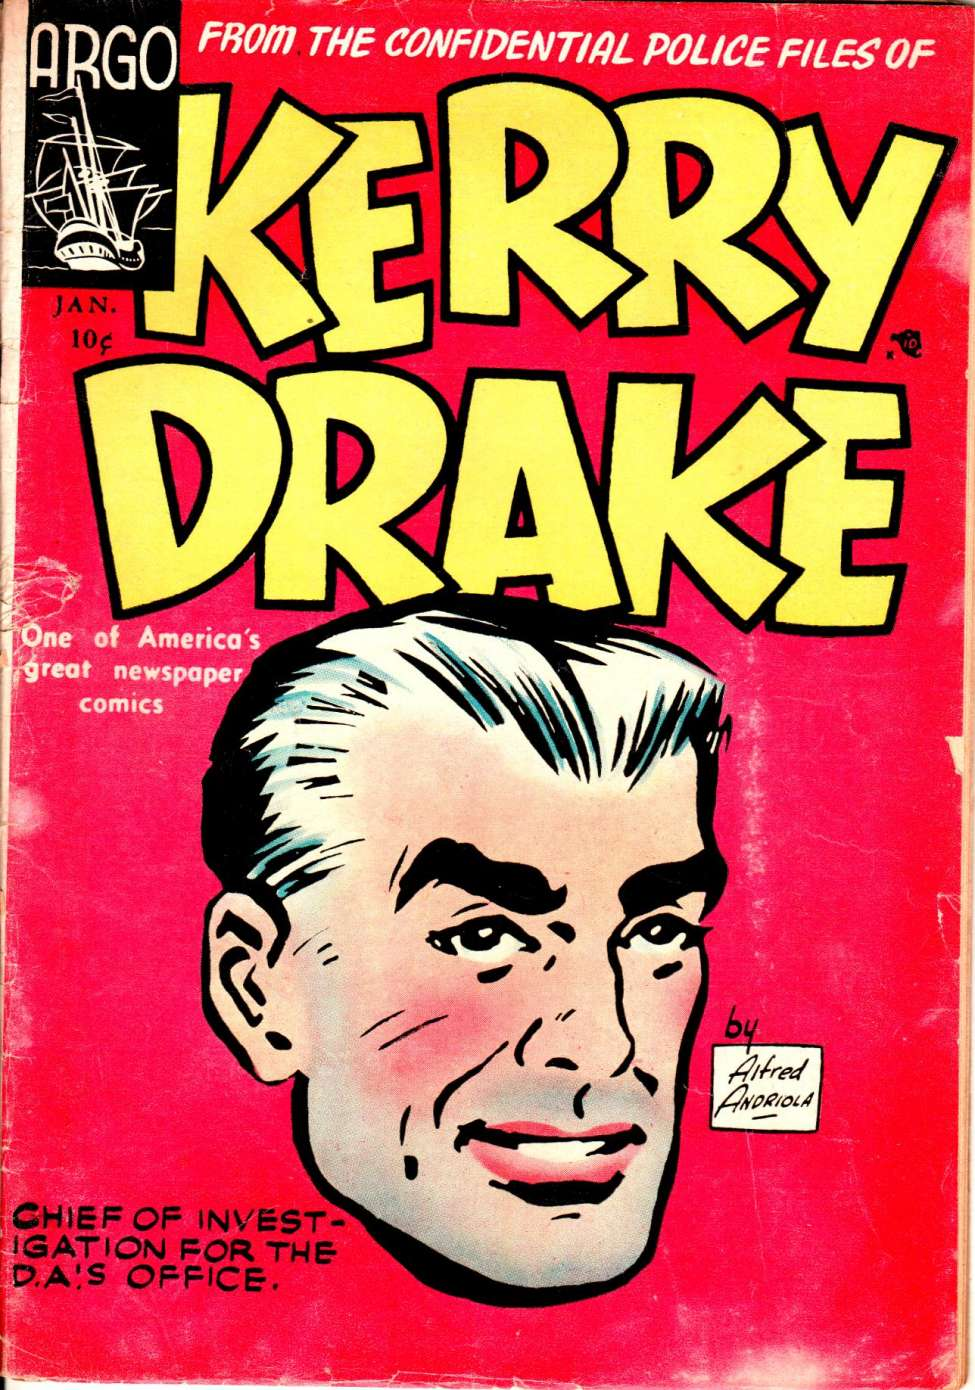 Kerry Drake, l'autre série policière d'Alfred Andriola - Page 4 010